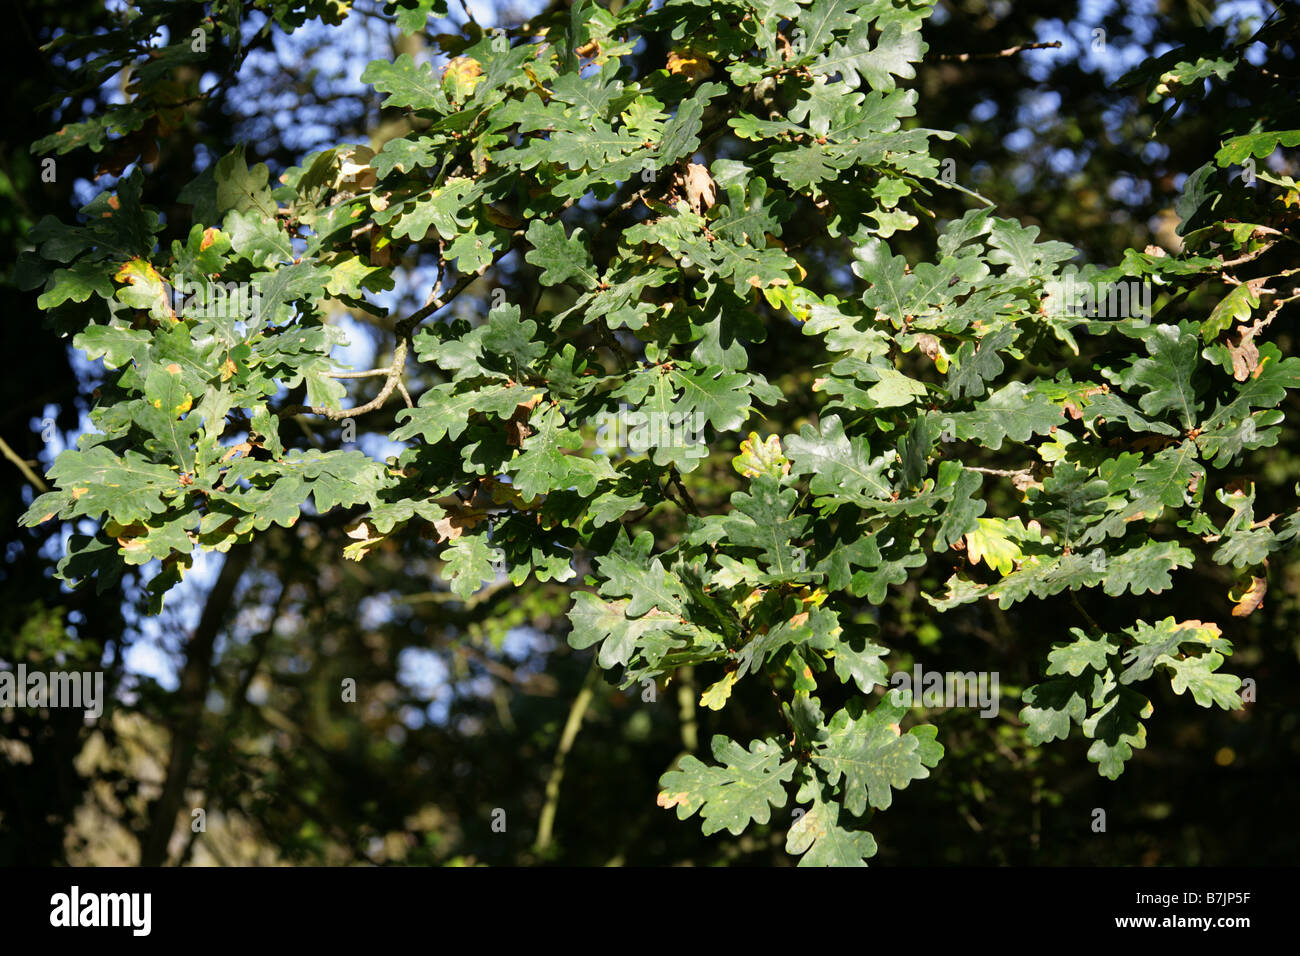 Pedunculate or English Oak Leaves, Quercus robur, Fagaceae Stock Photo